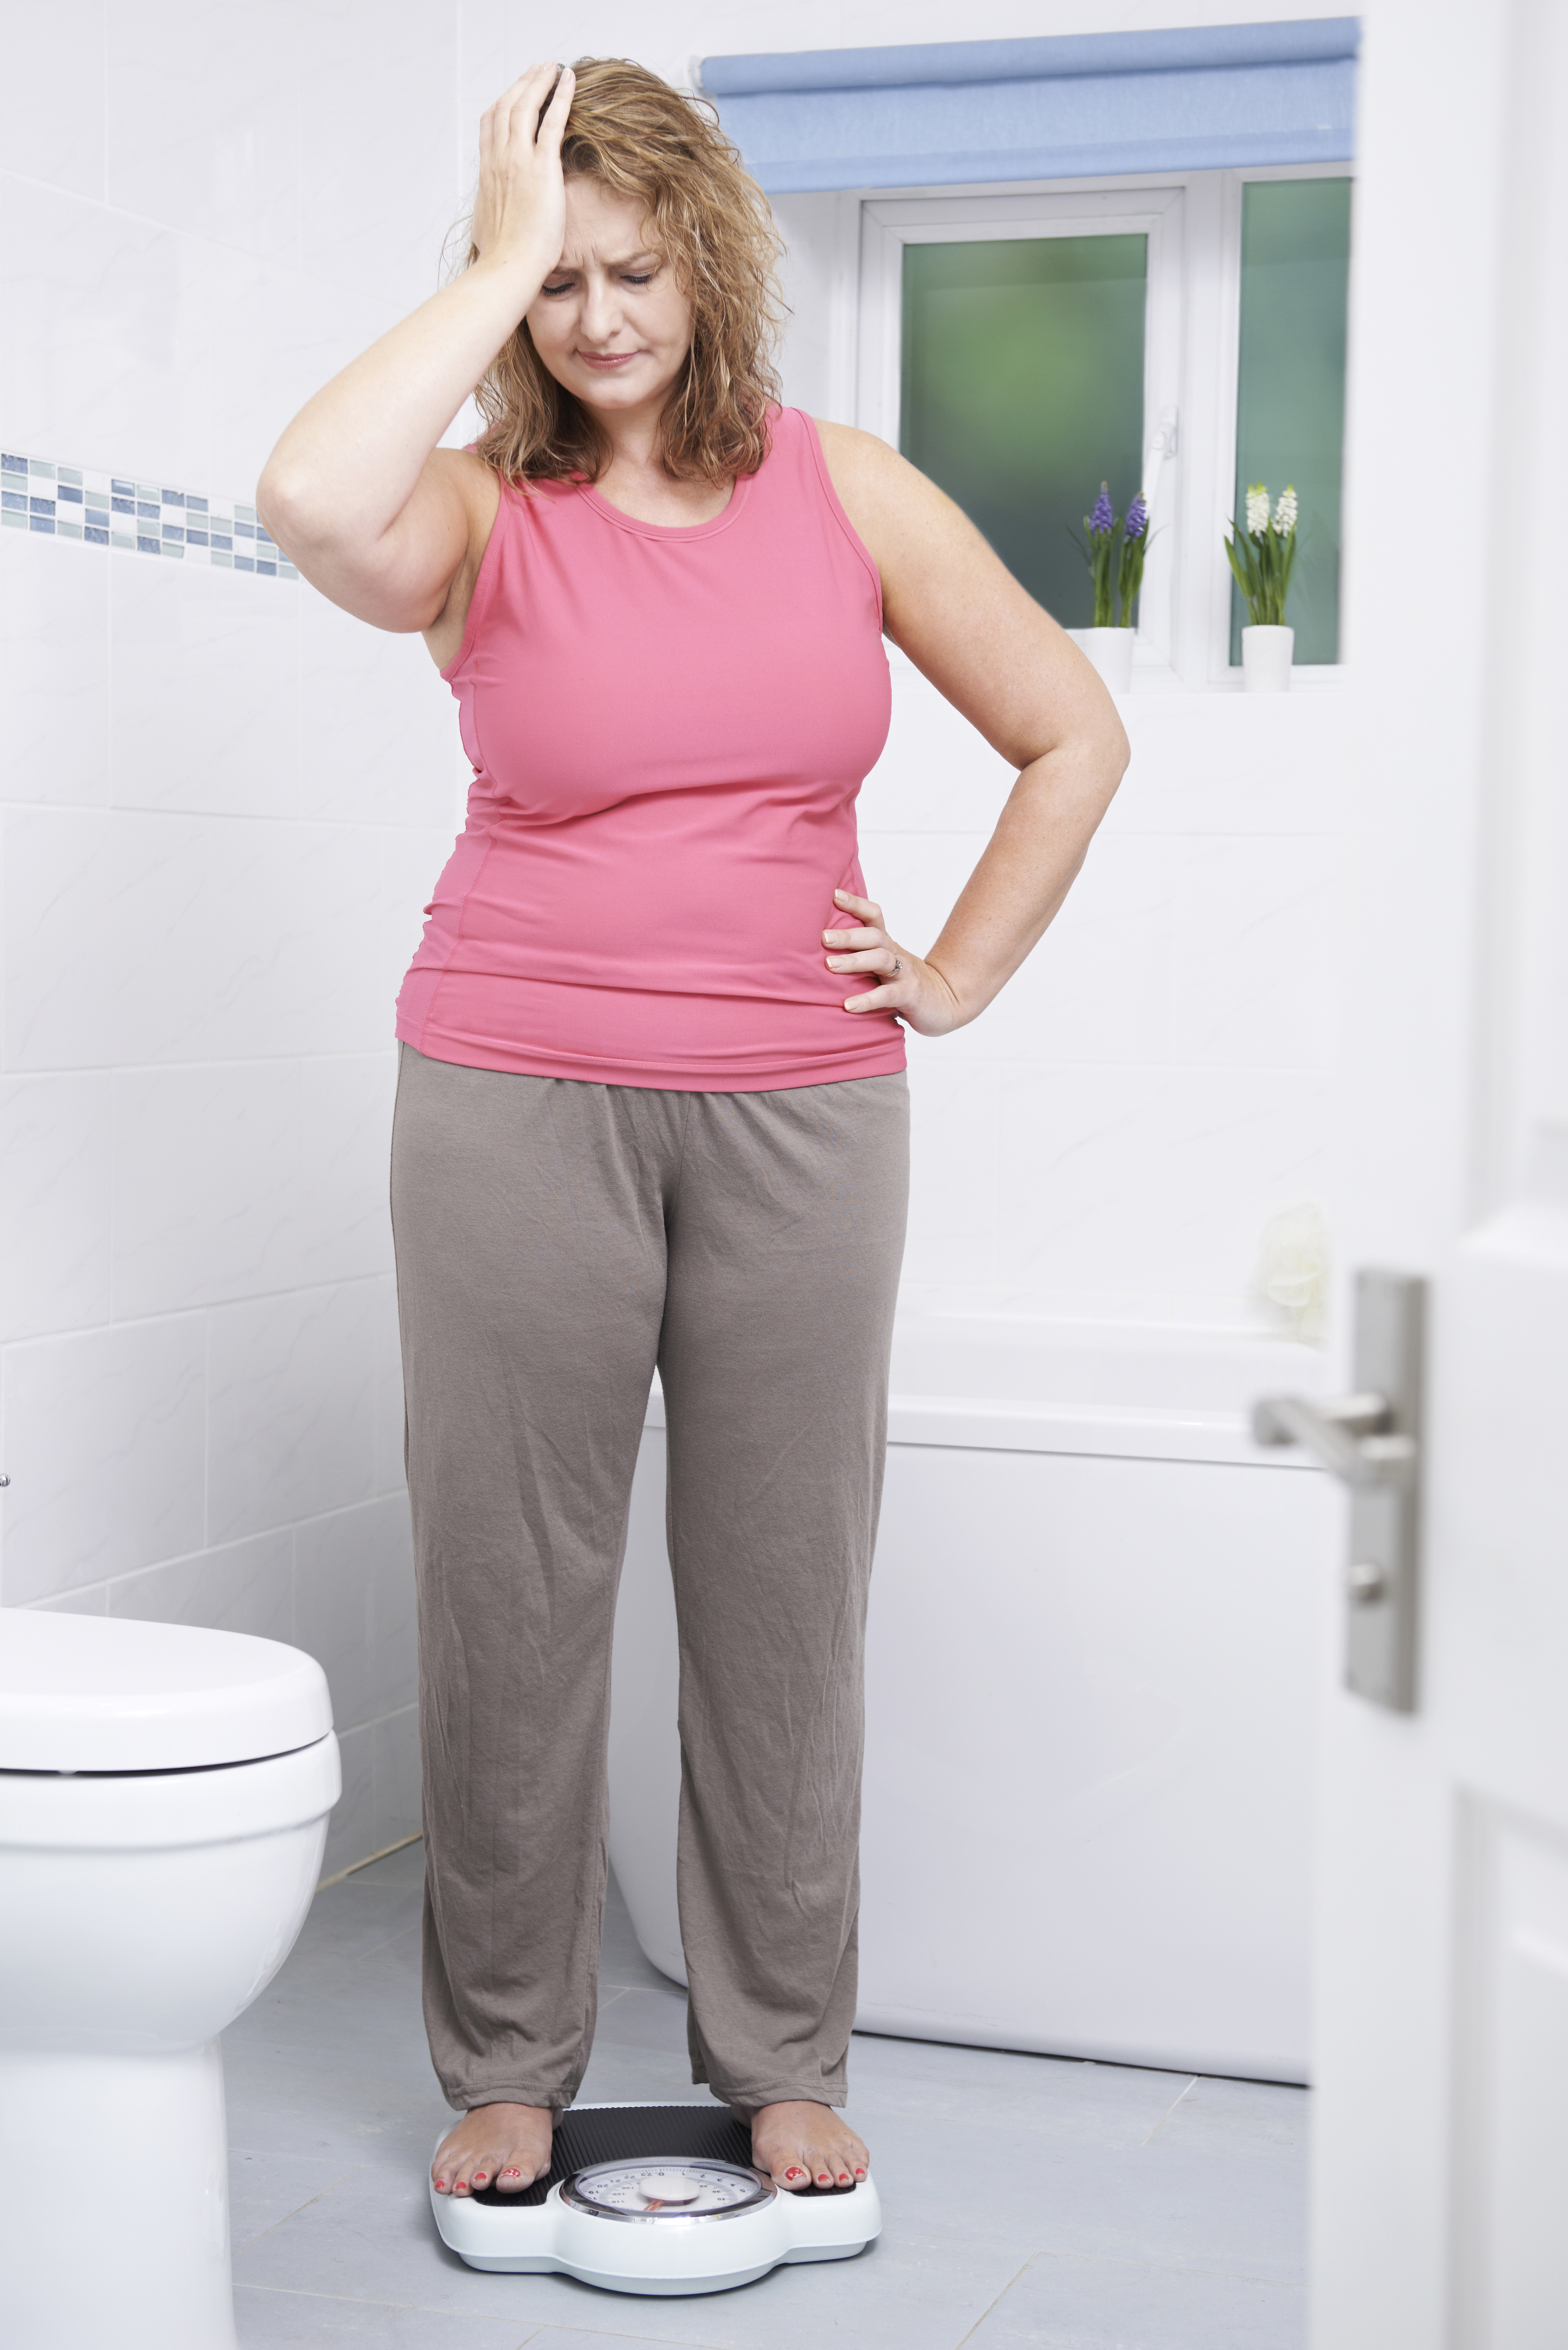 Costco green tea fat burner side effects picture 9